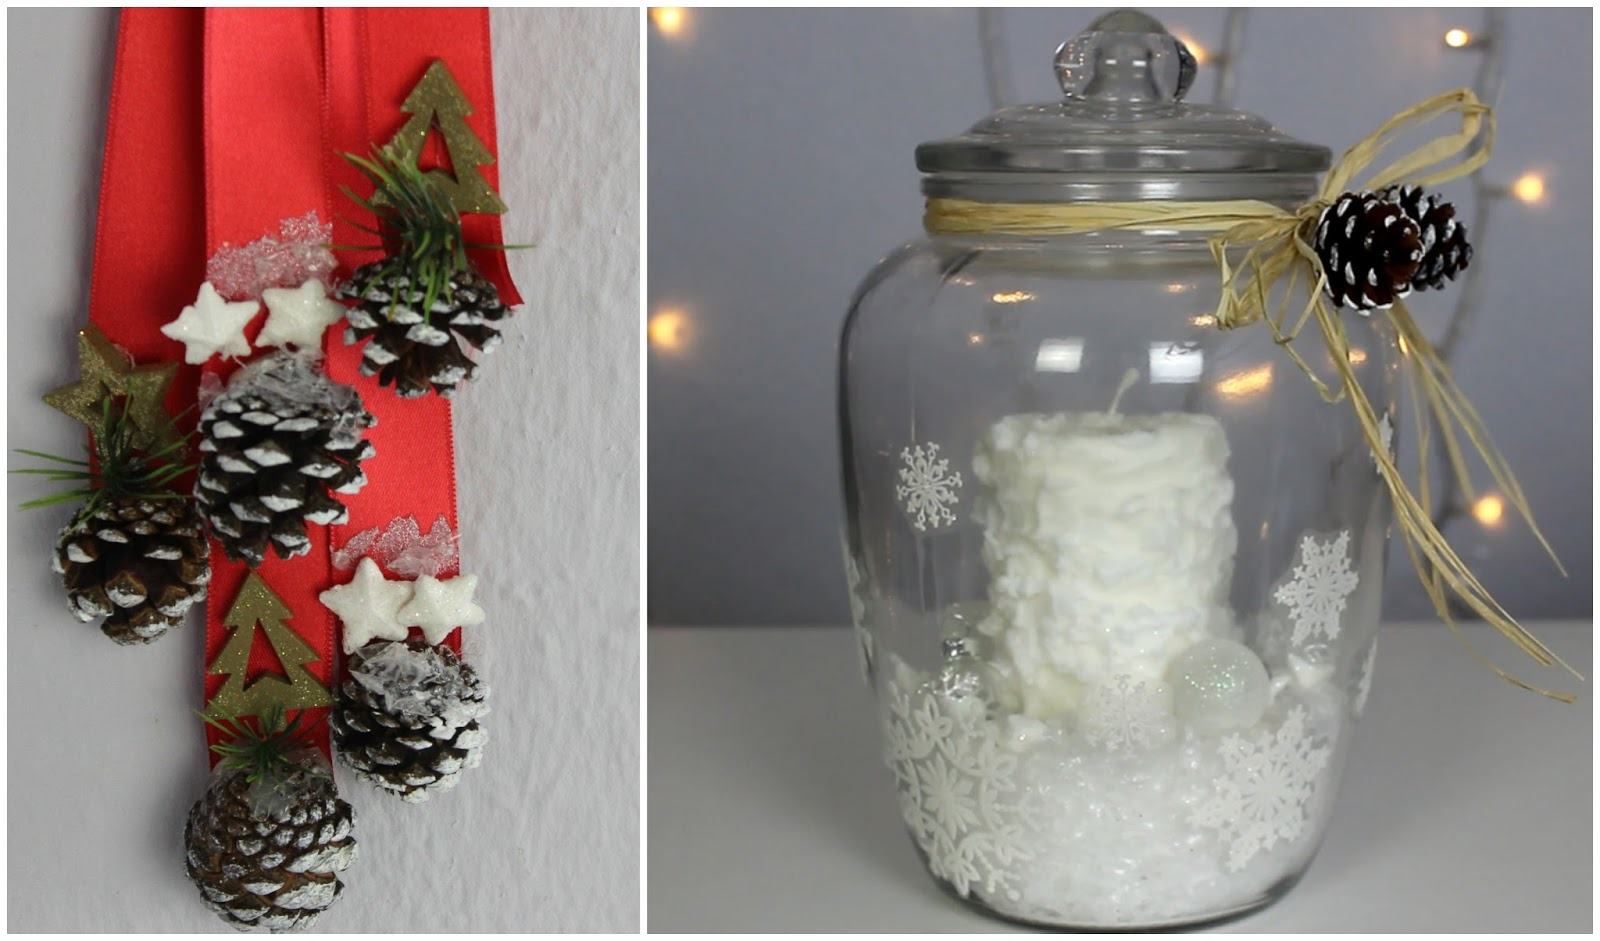 Rain bows and fairytales unsere weihnachtsdeko - Nanu nana weihnachtsdeko ...